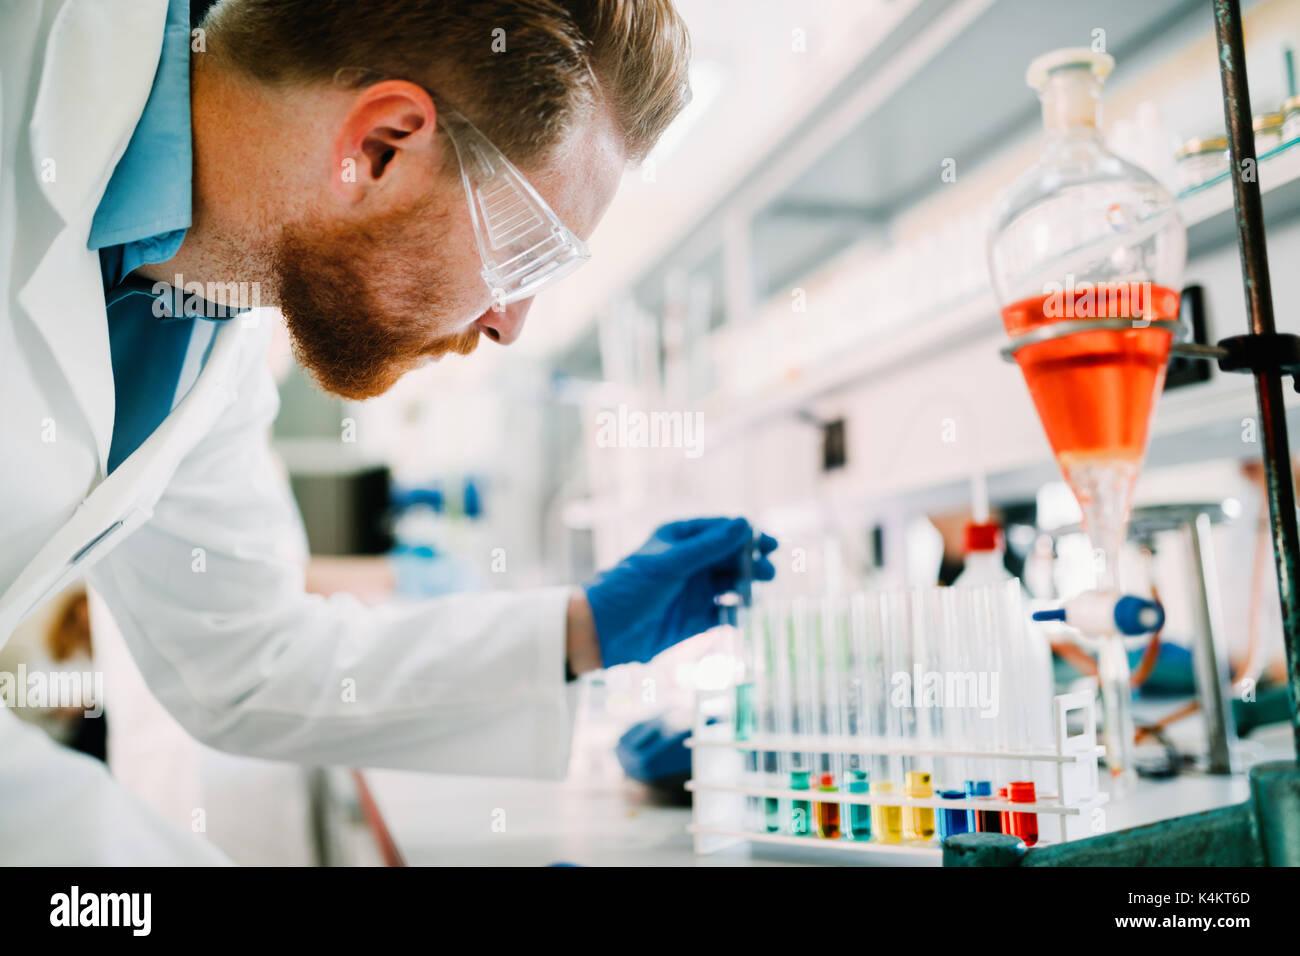 Beau étudiant en chimie working in laboratory Photo Stock